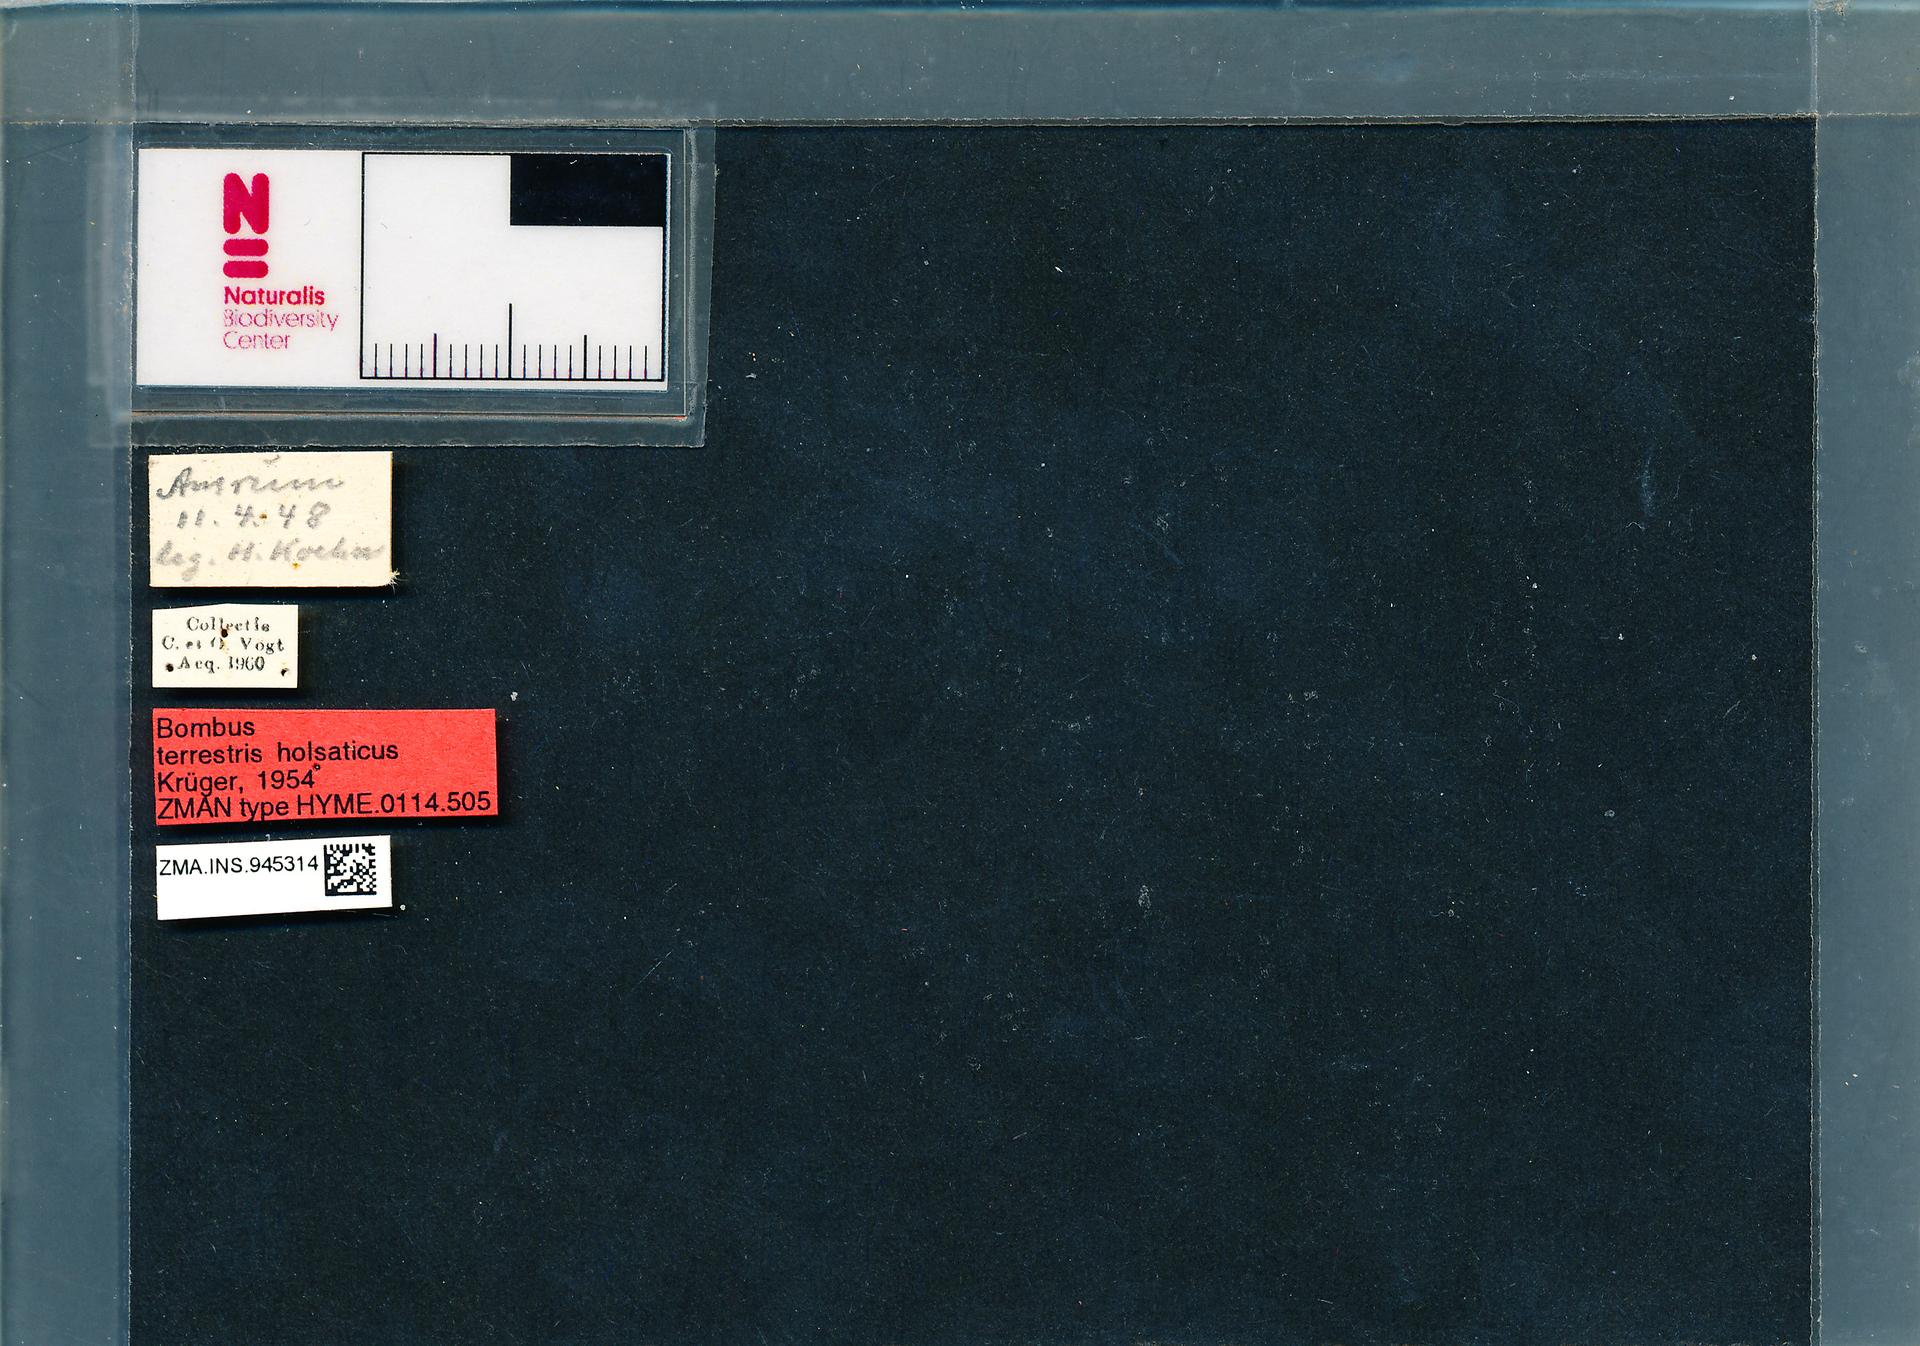 ZMA.INS.945314 | Bombus (Bombus s.s.) terrestris terrestris s.s. Krüger, 1954